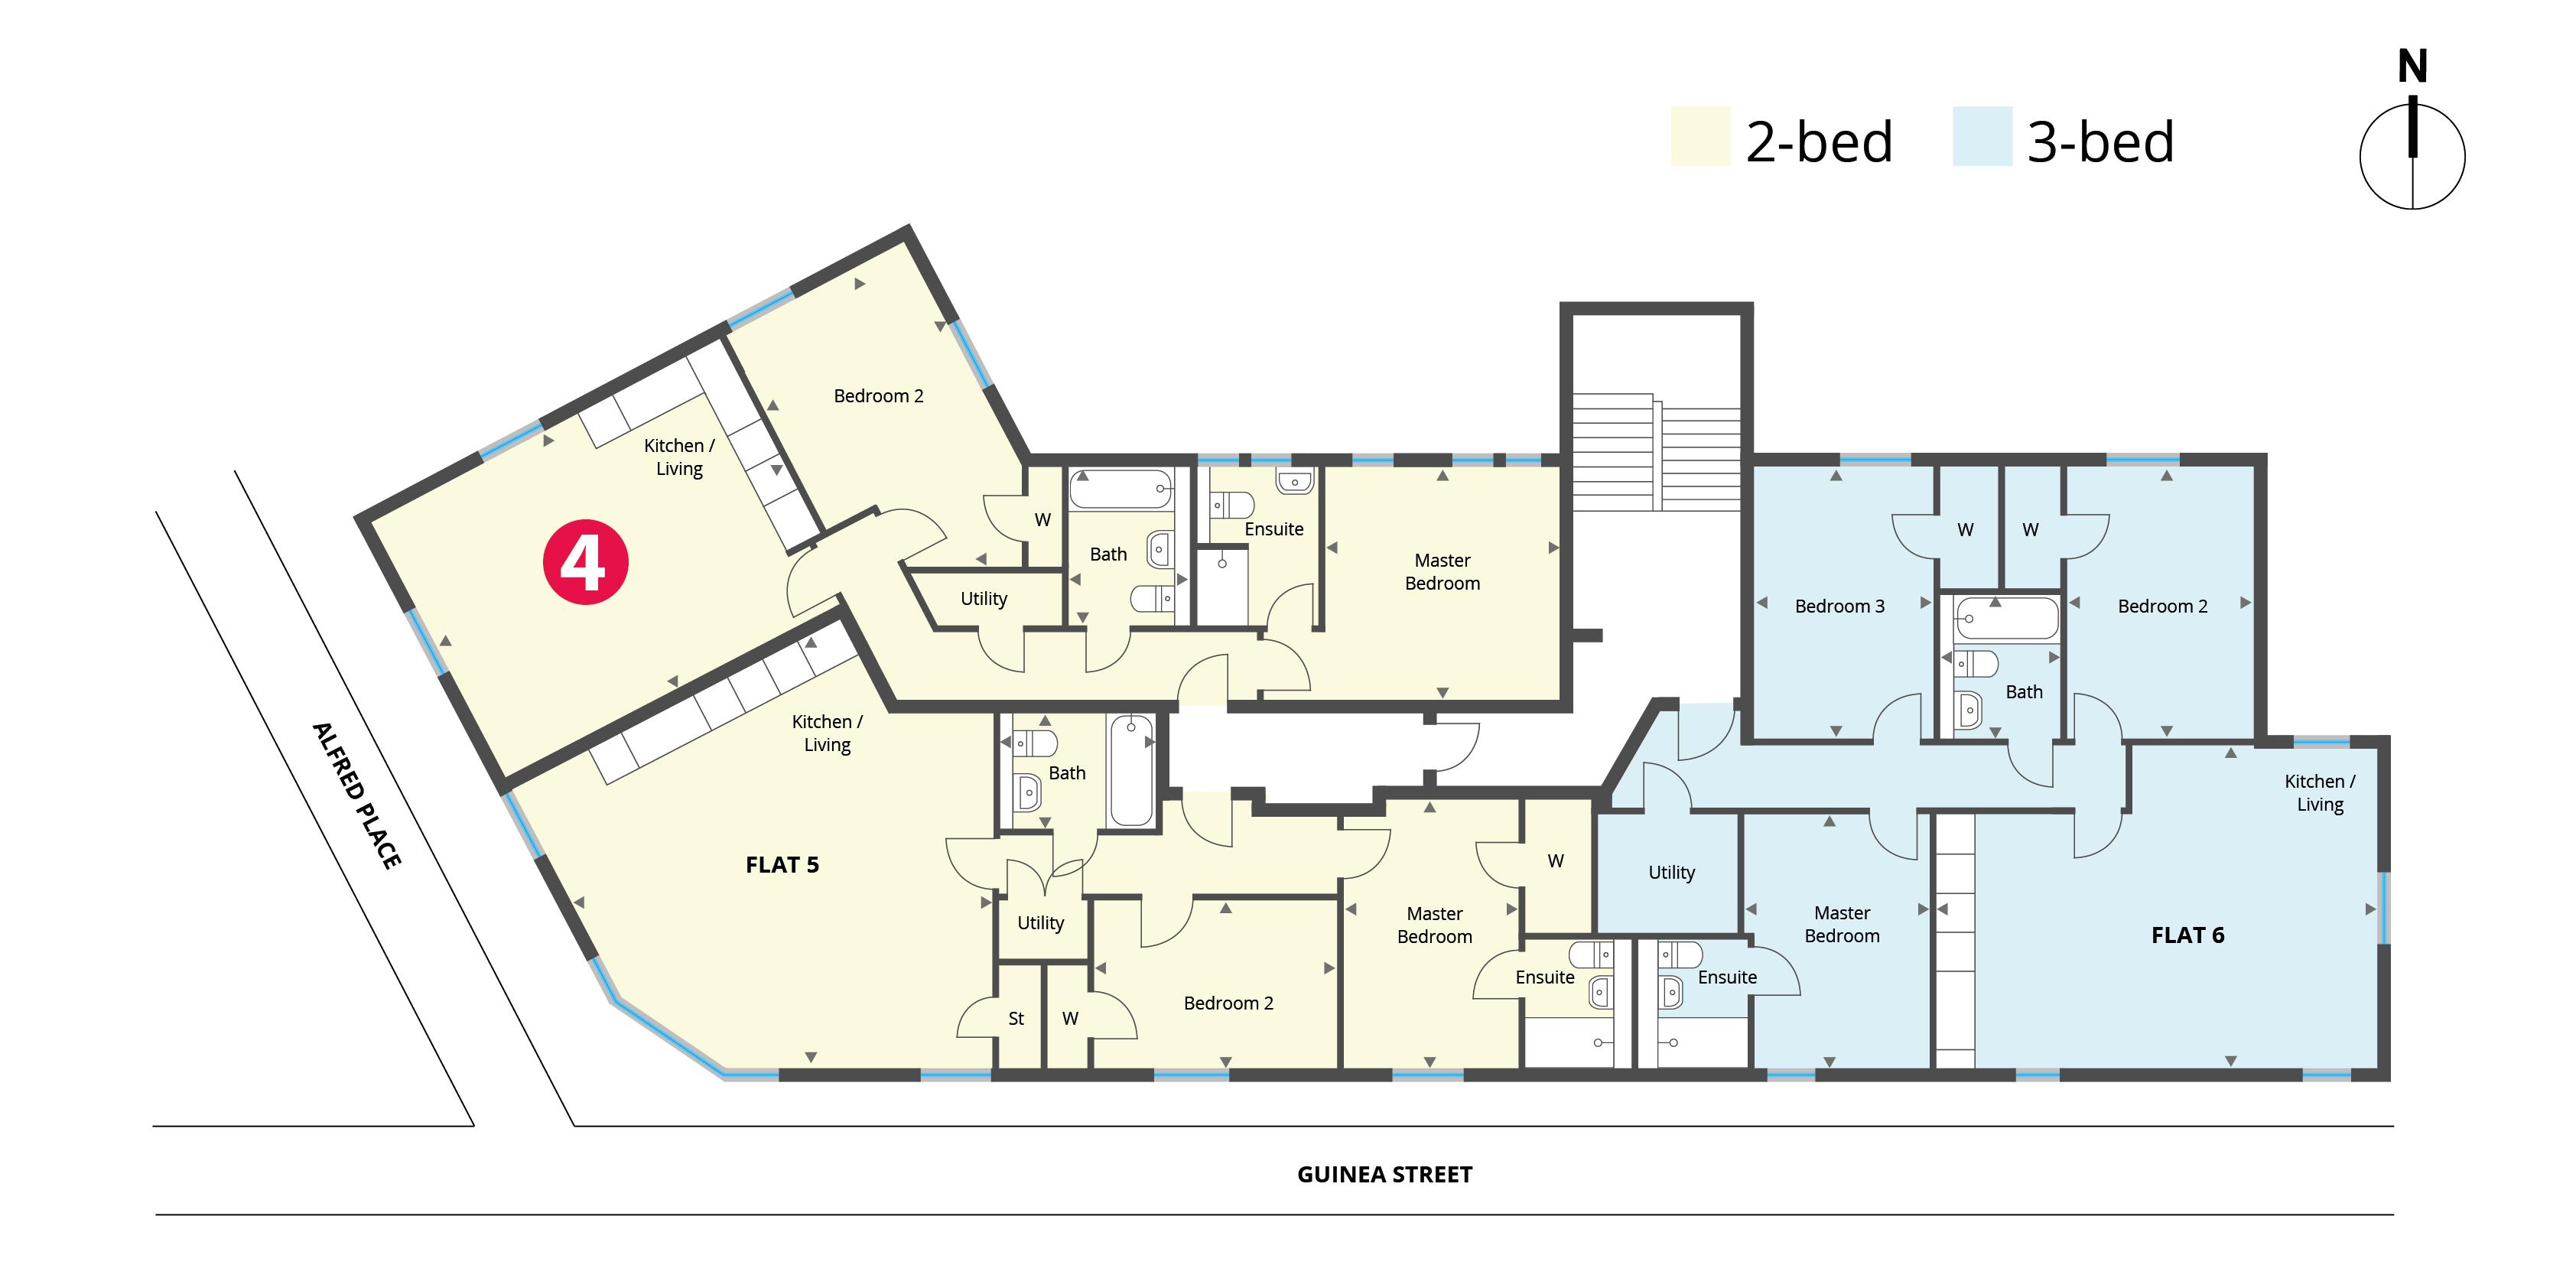 Floorplan for Flat 4